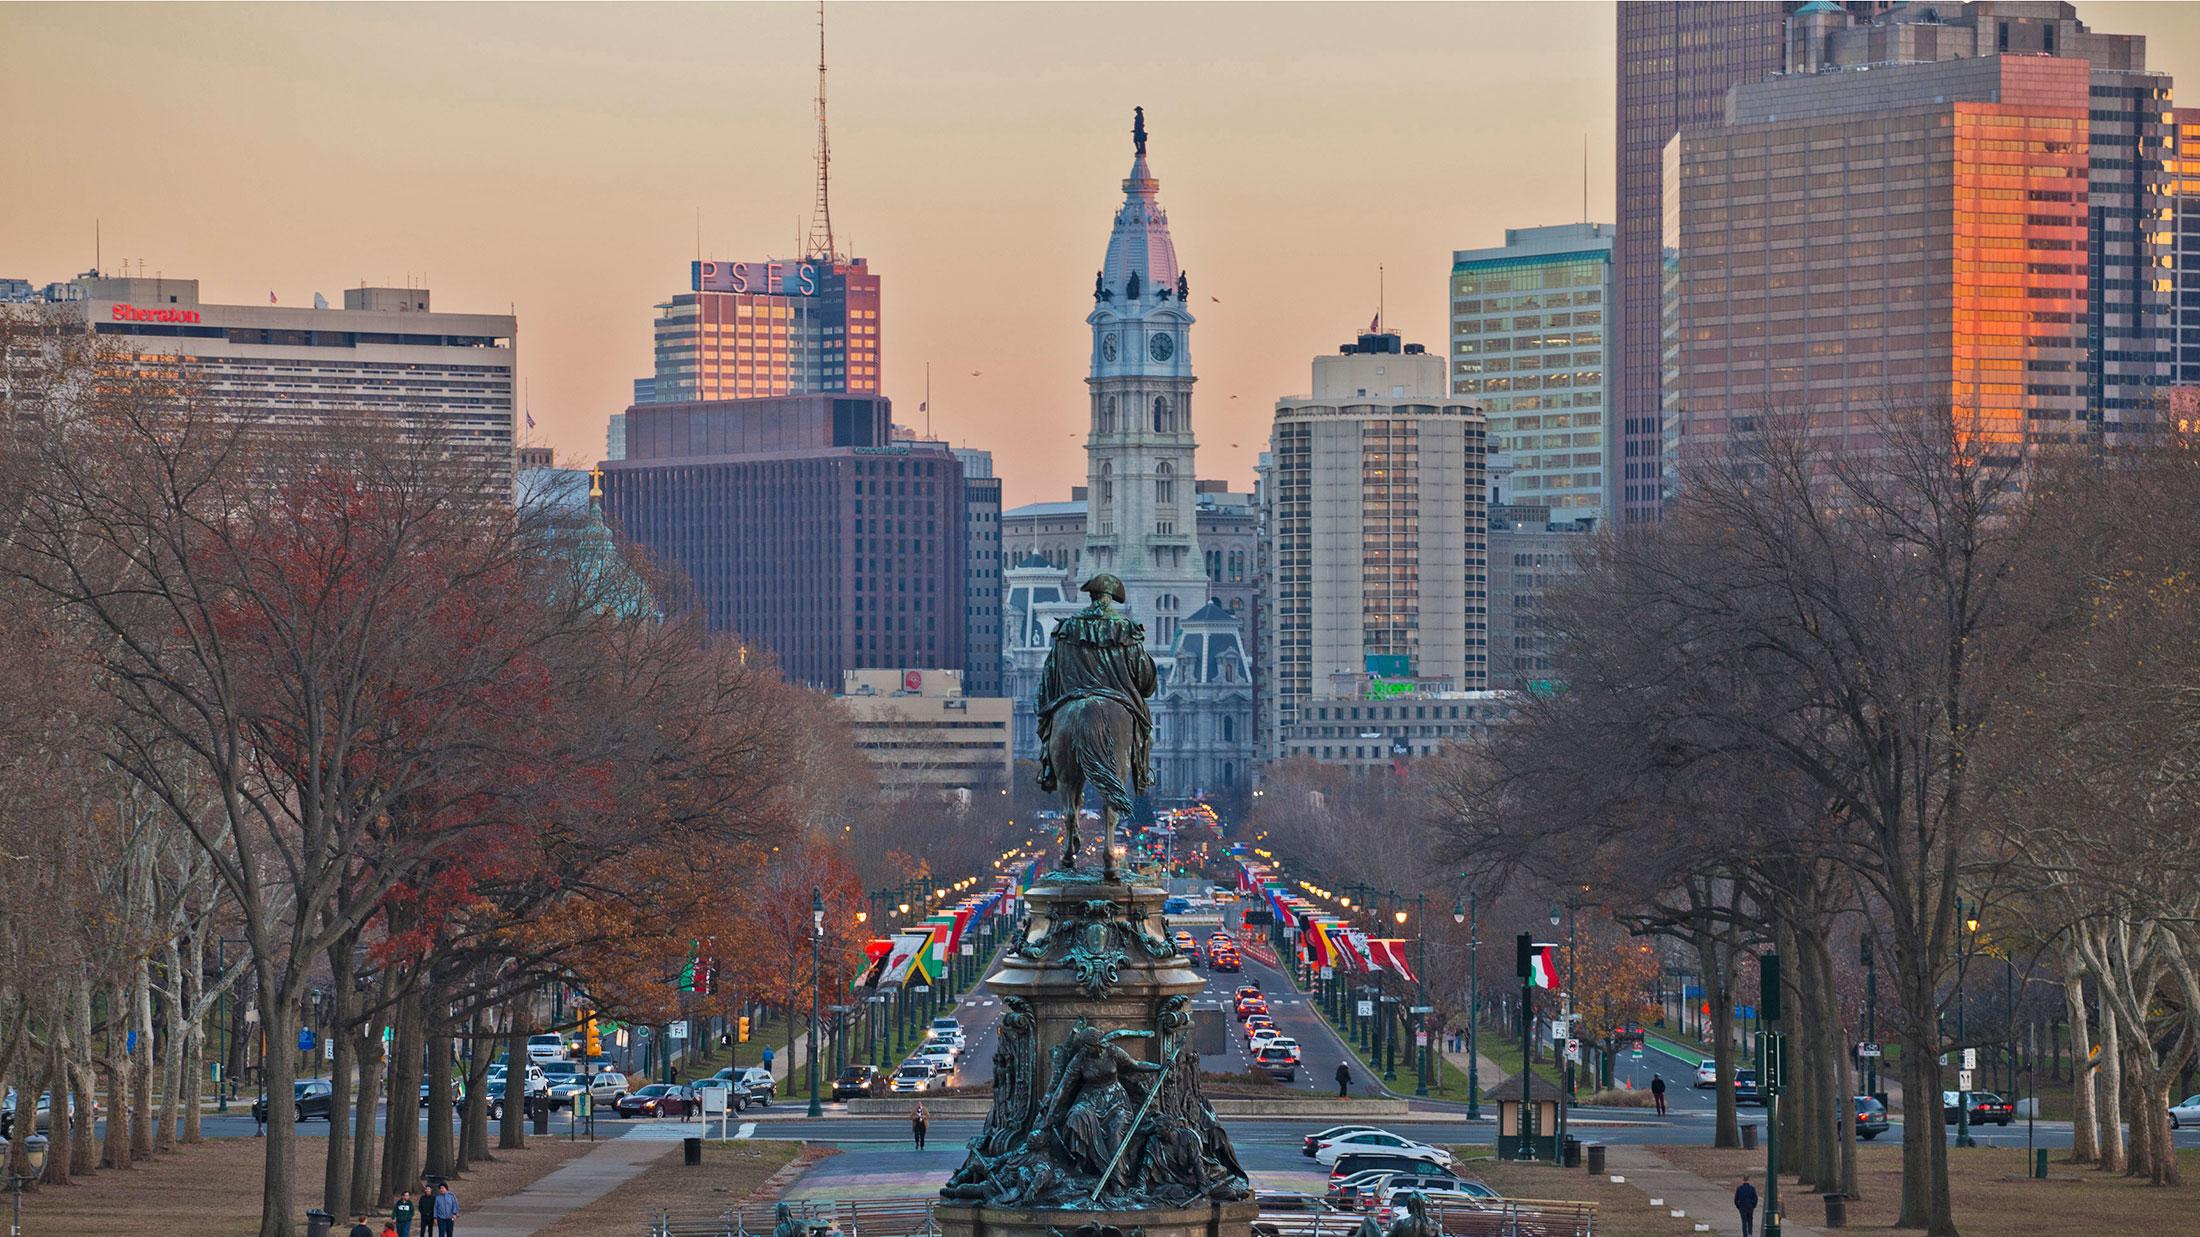 Nơi sống tốt nhất ở Mỹ - Philadelphia, Pennsylvania